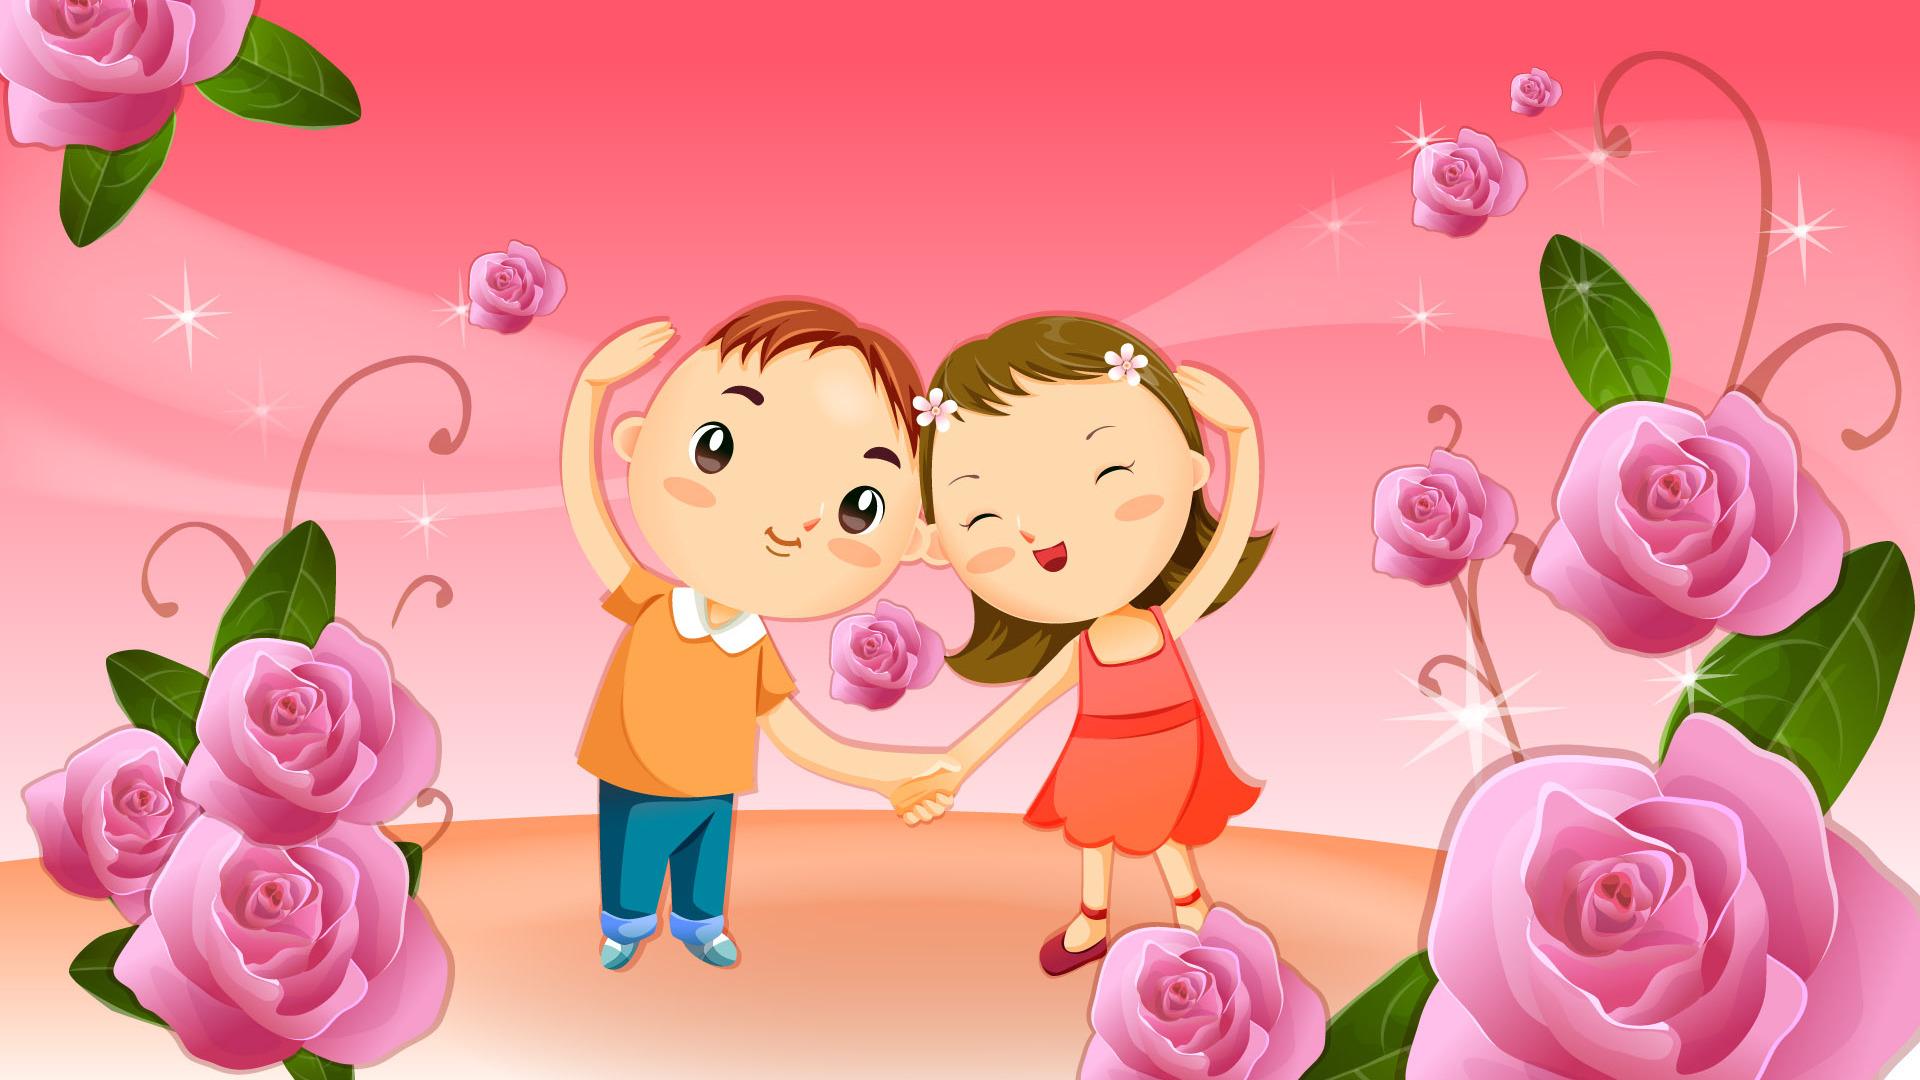 Cute Cartoon Desktop Wallpapers - WallpaperSafari